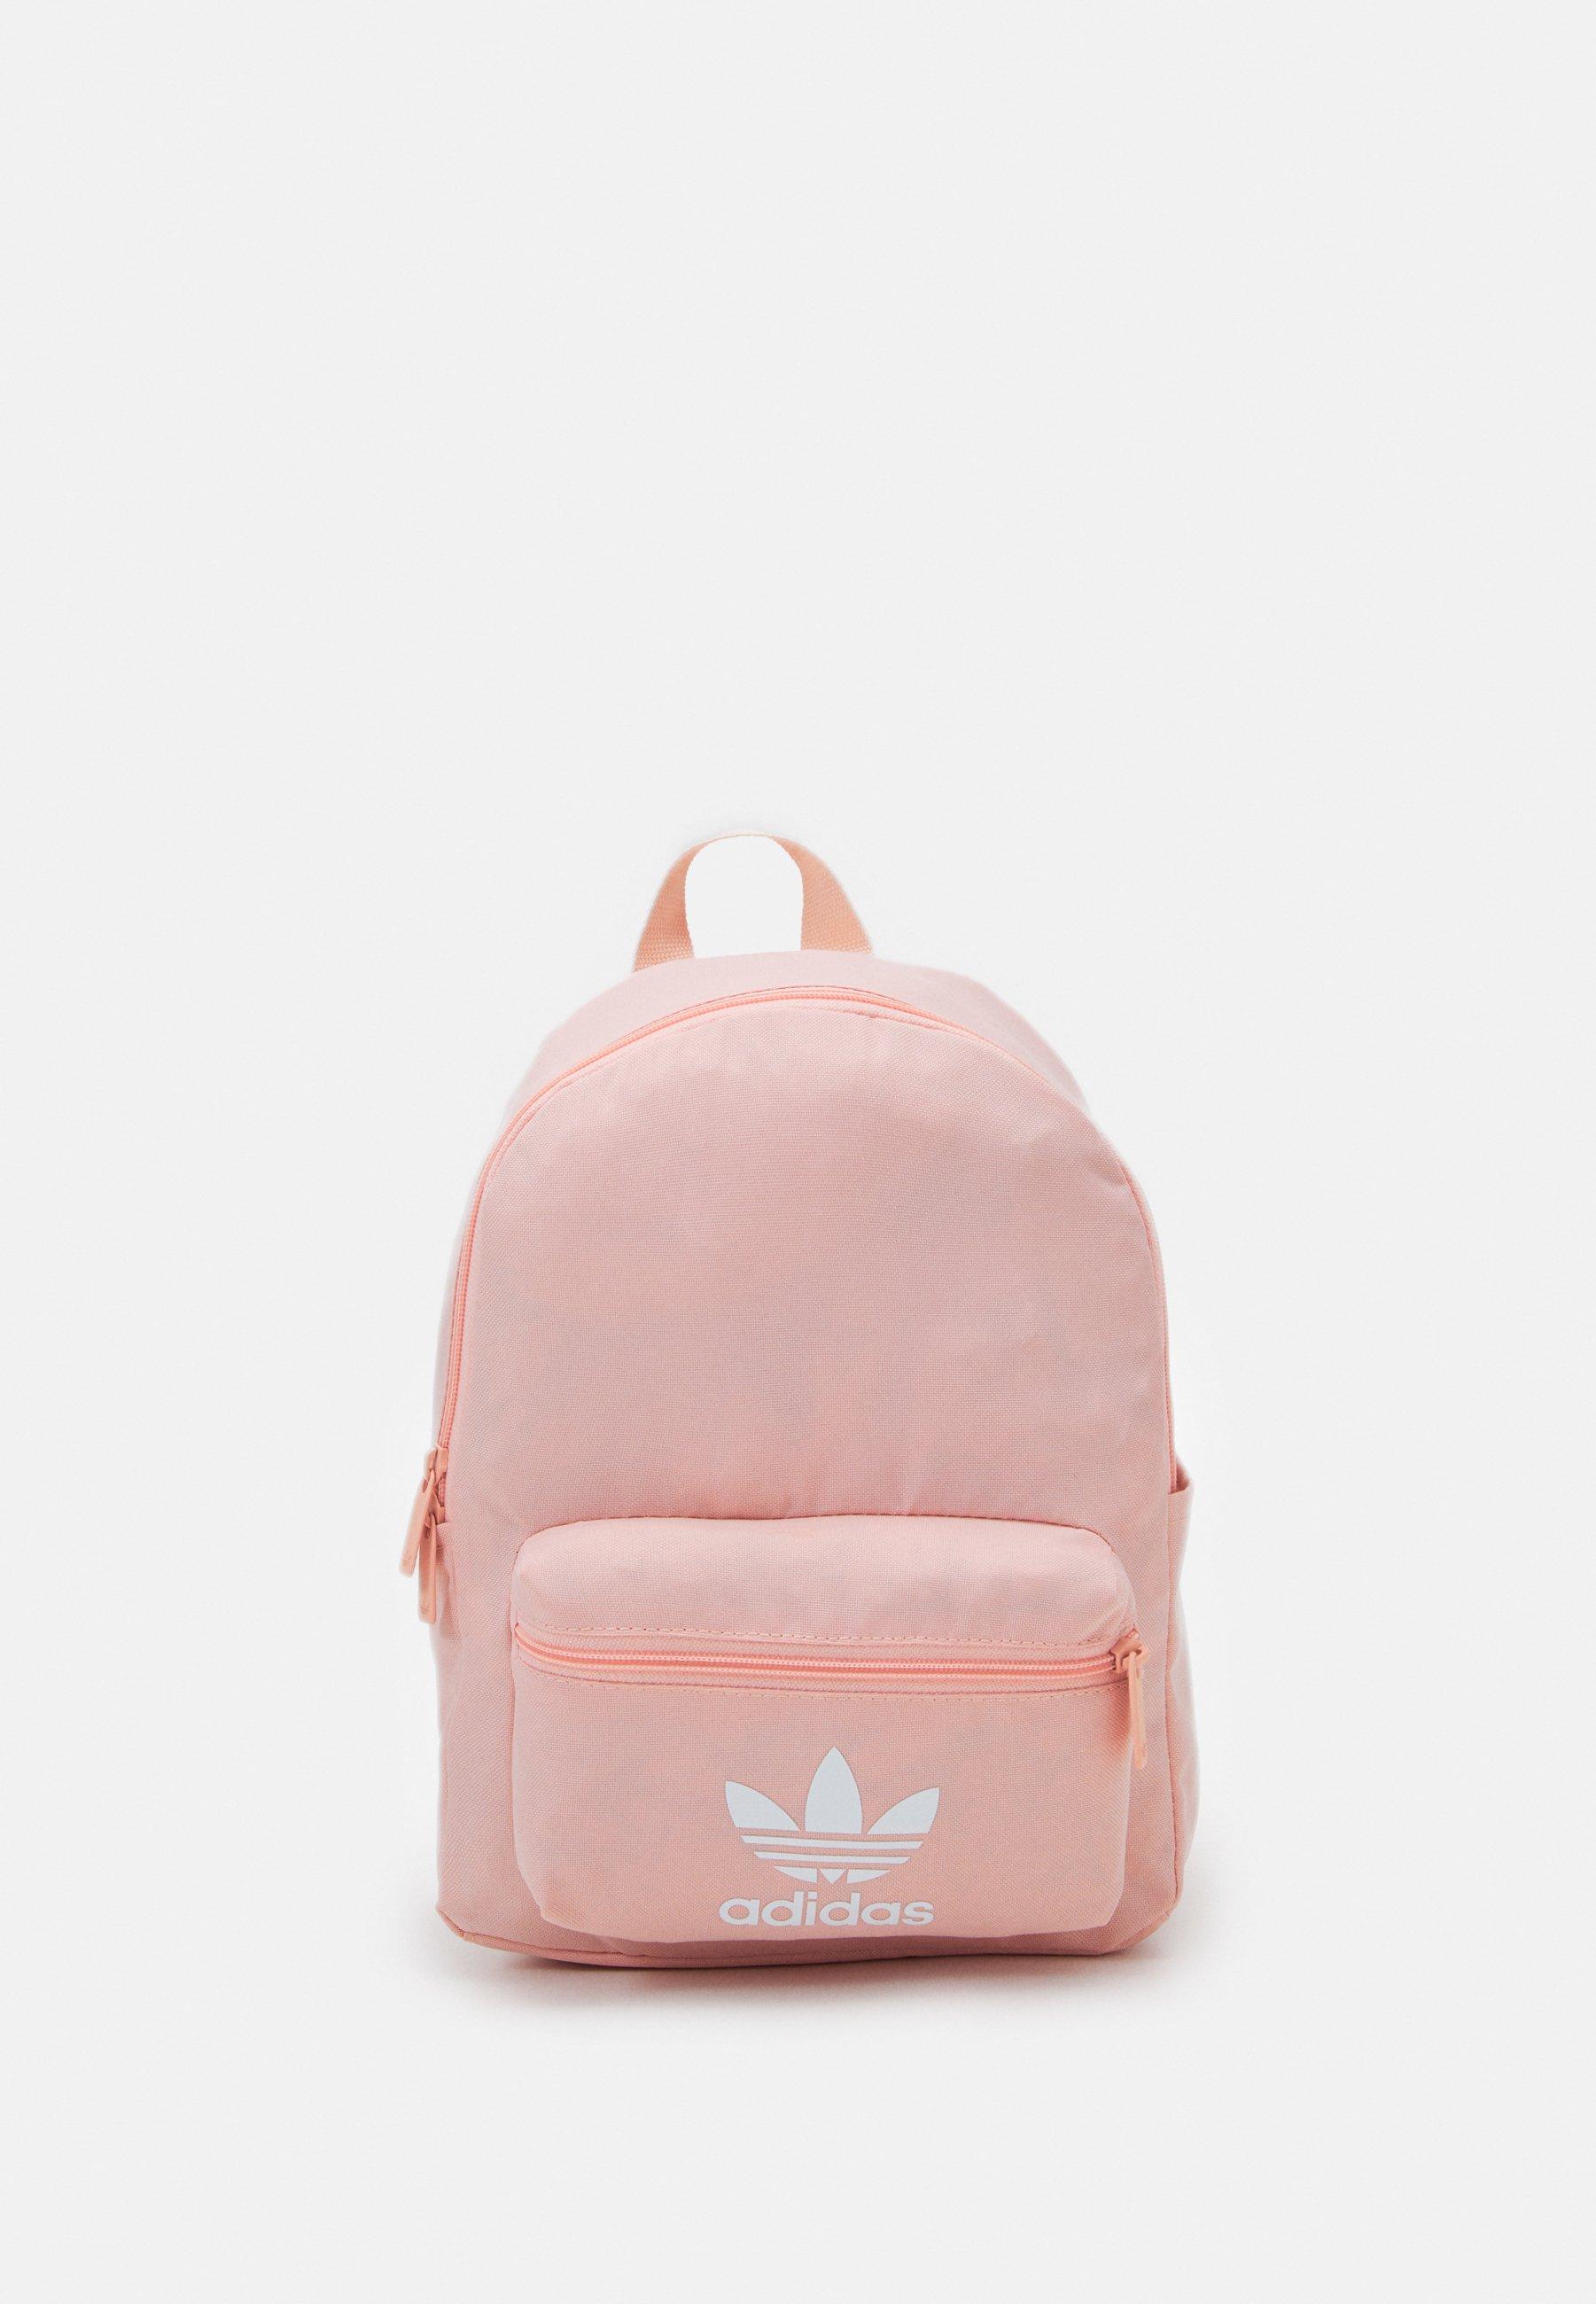 Adidas Originals Small Adicolor Backpack - Reppu Light Pink